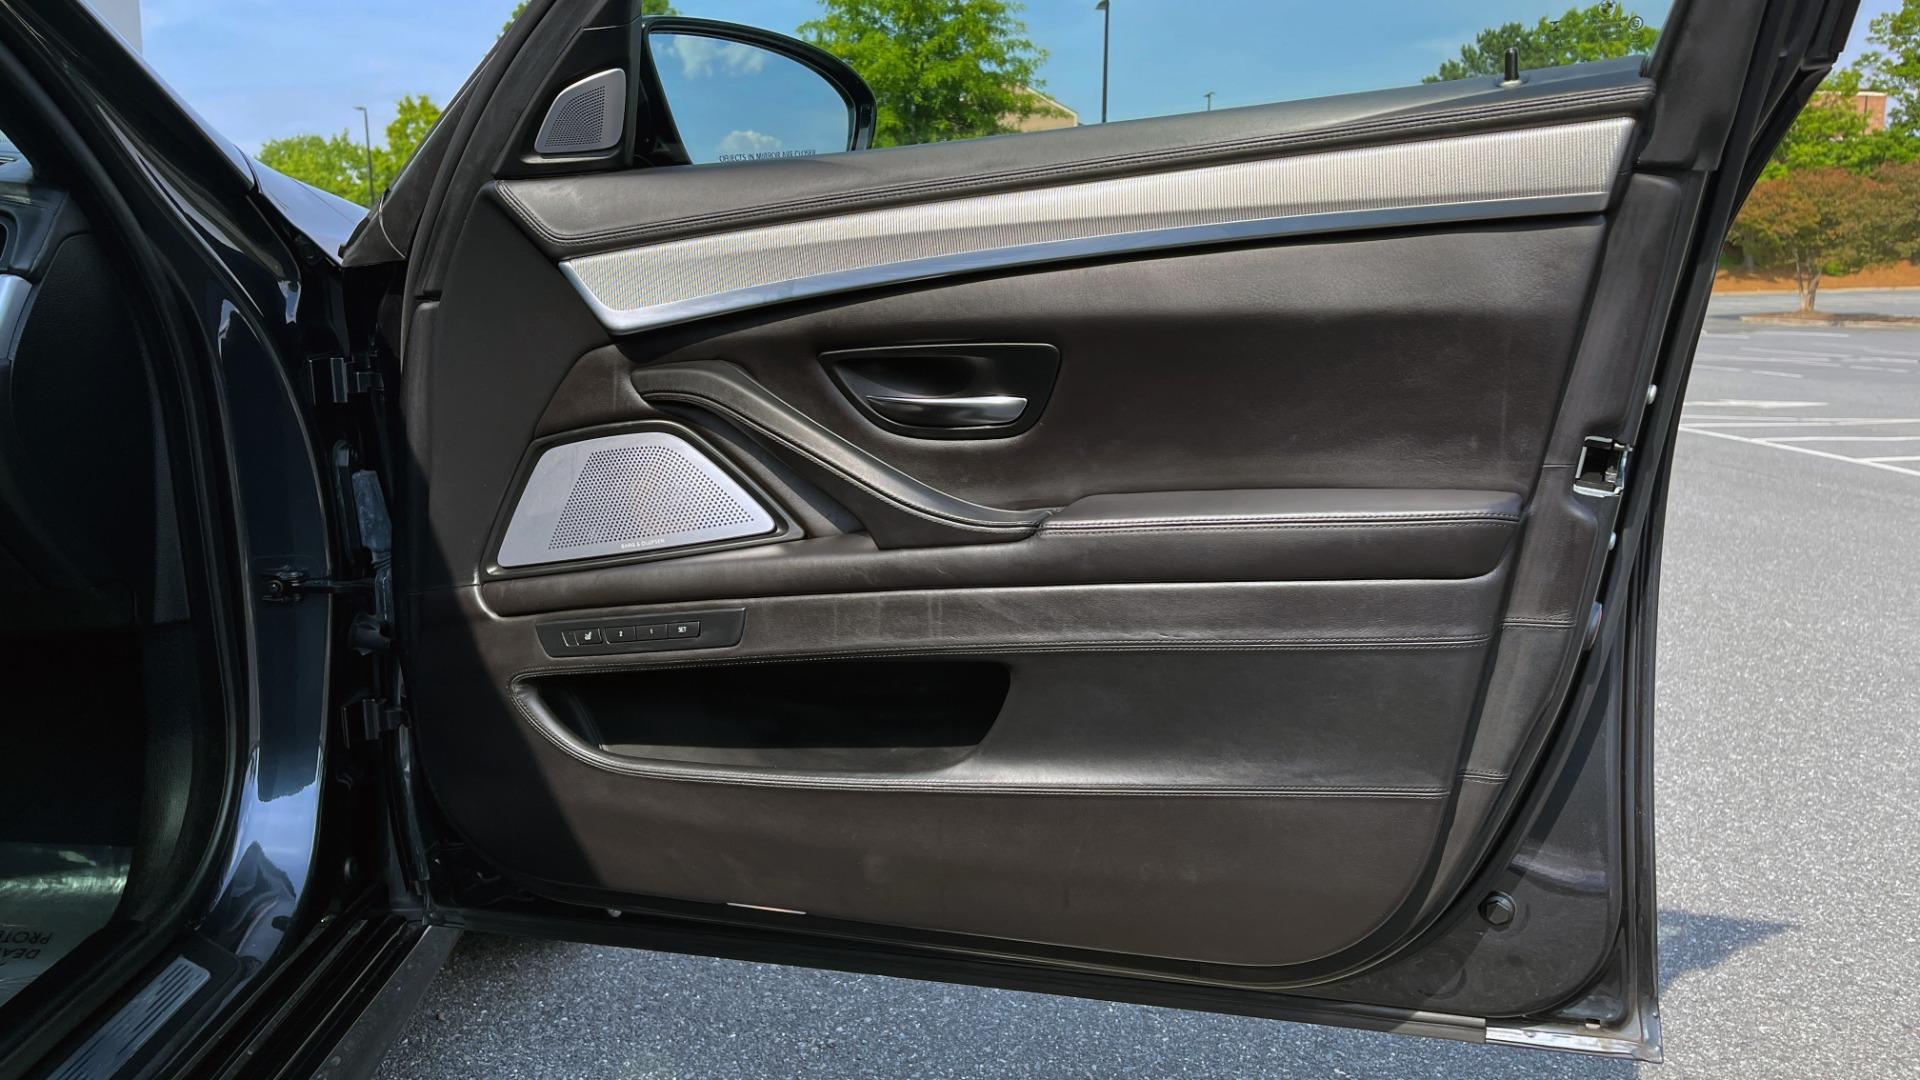 Used 2015 BMW M5 SEDAN / EXEC PKG / HUD / NAV / B&O SND / SUNROOF / REARVIEW for sale Sold at Formula Imports in Charlotte NC 28227 88